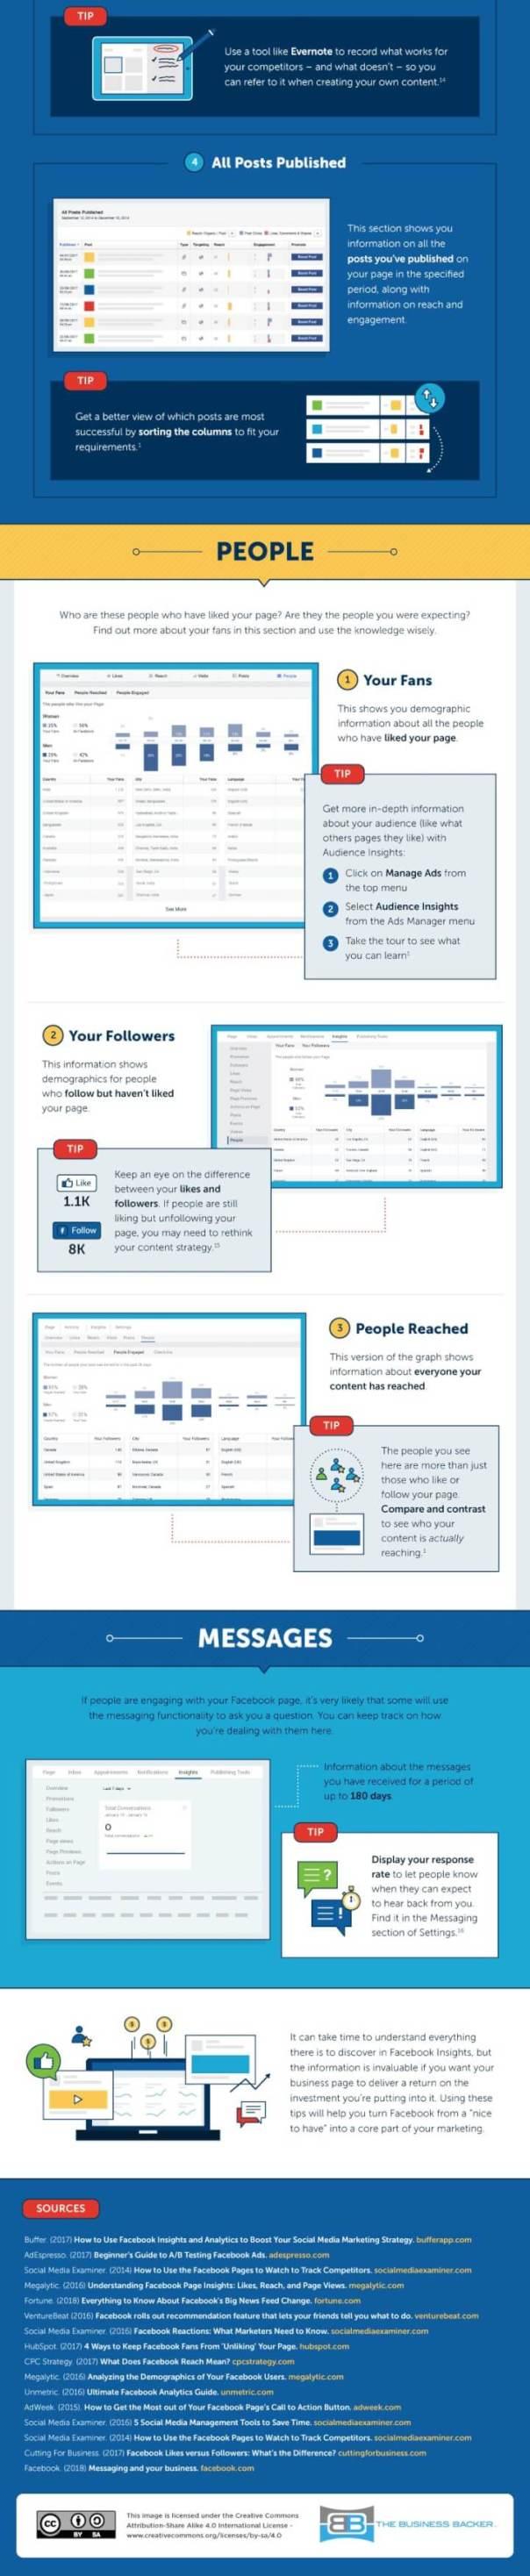 Facebook Marketing Archives - Tabsite Blog